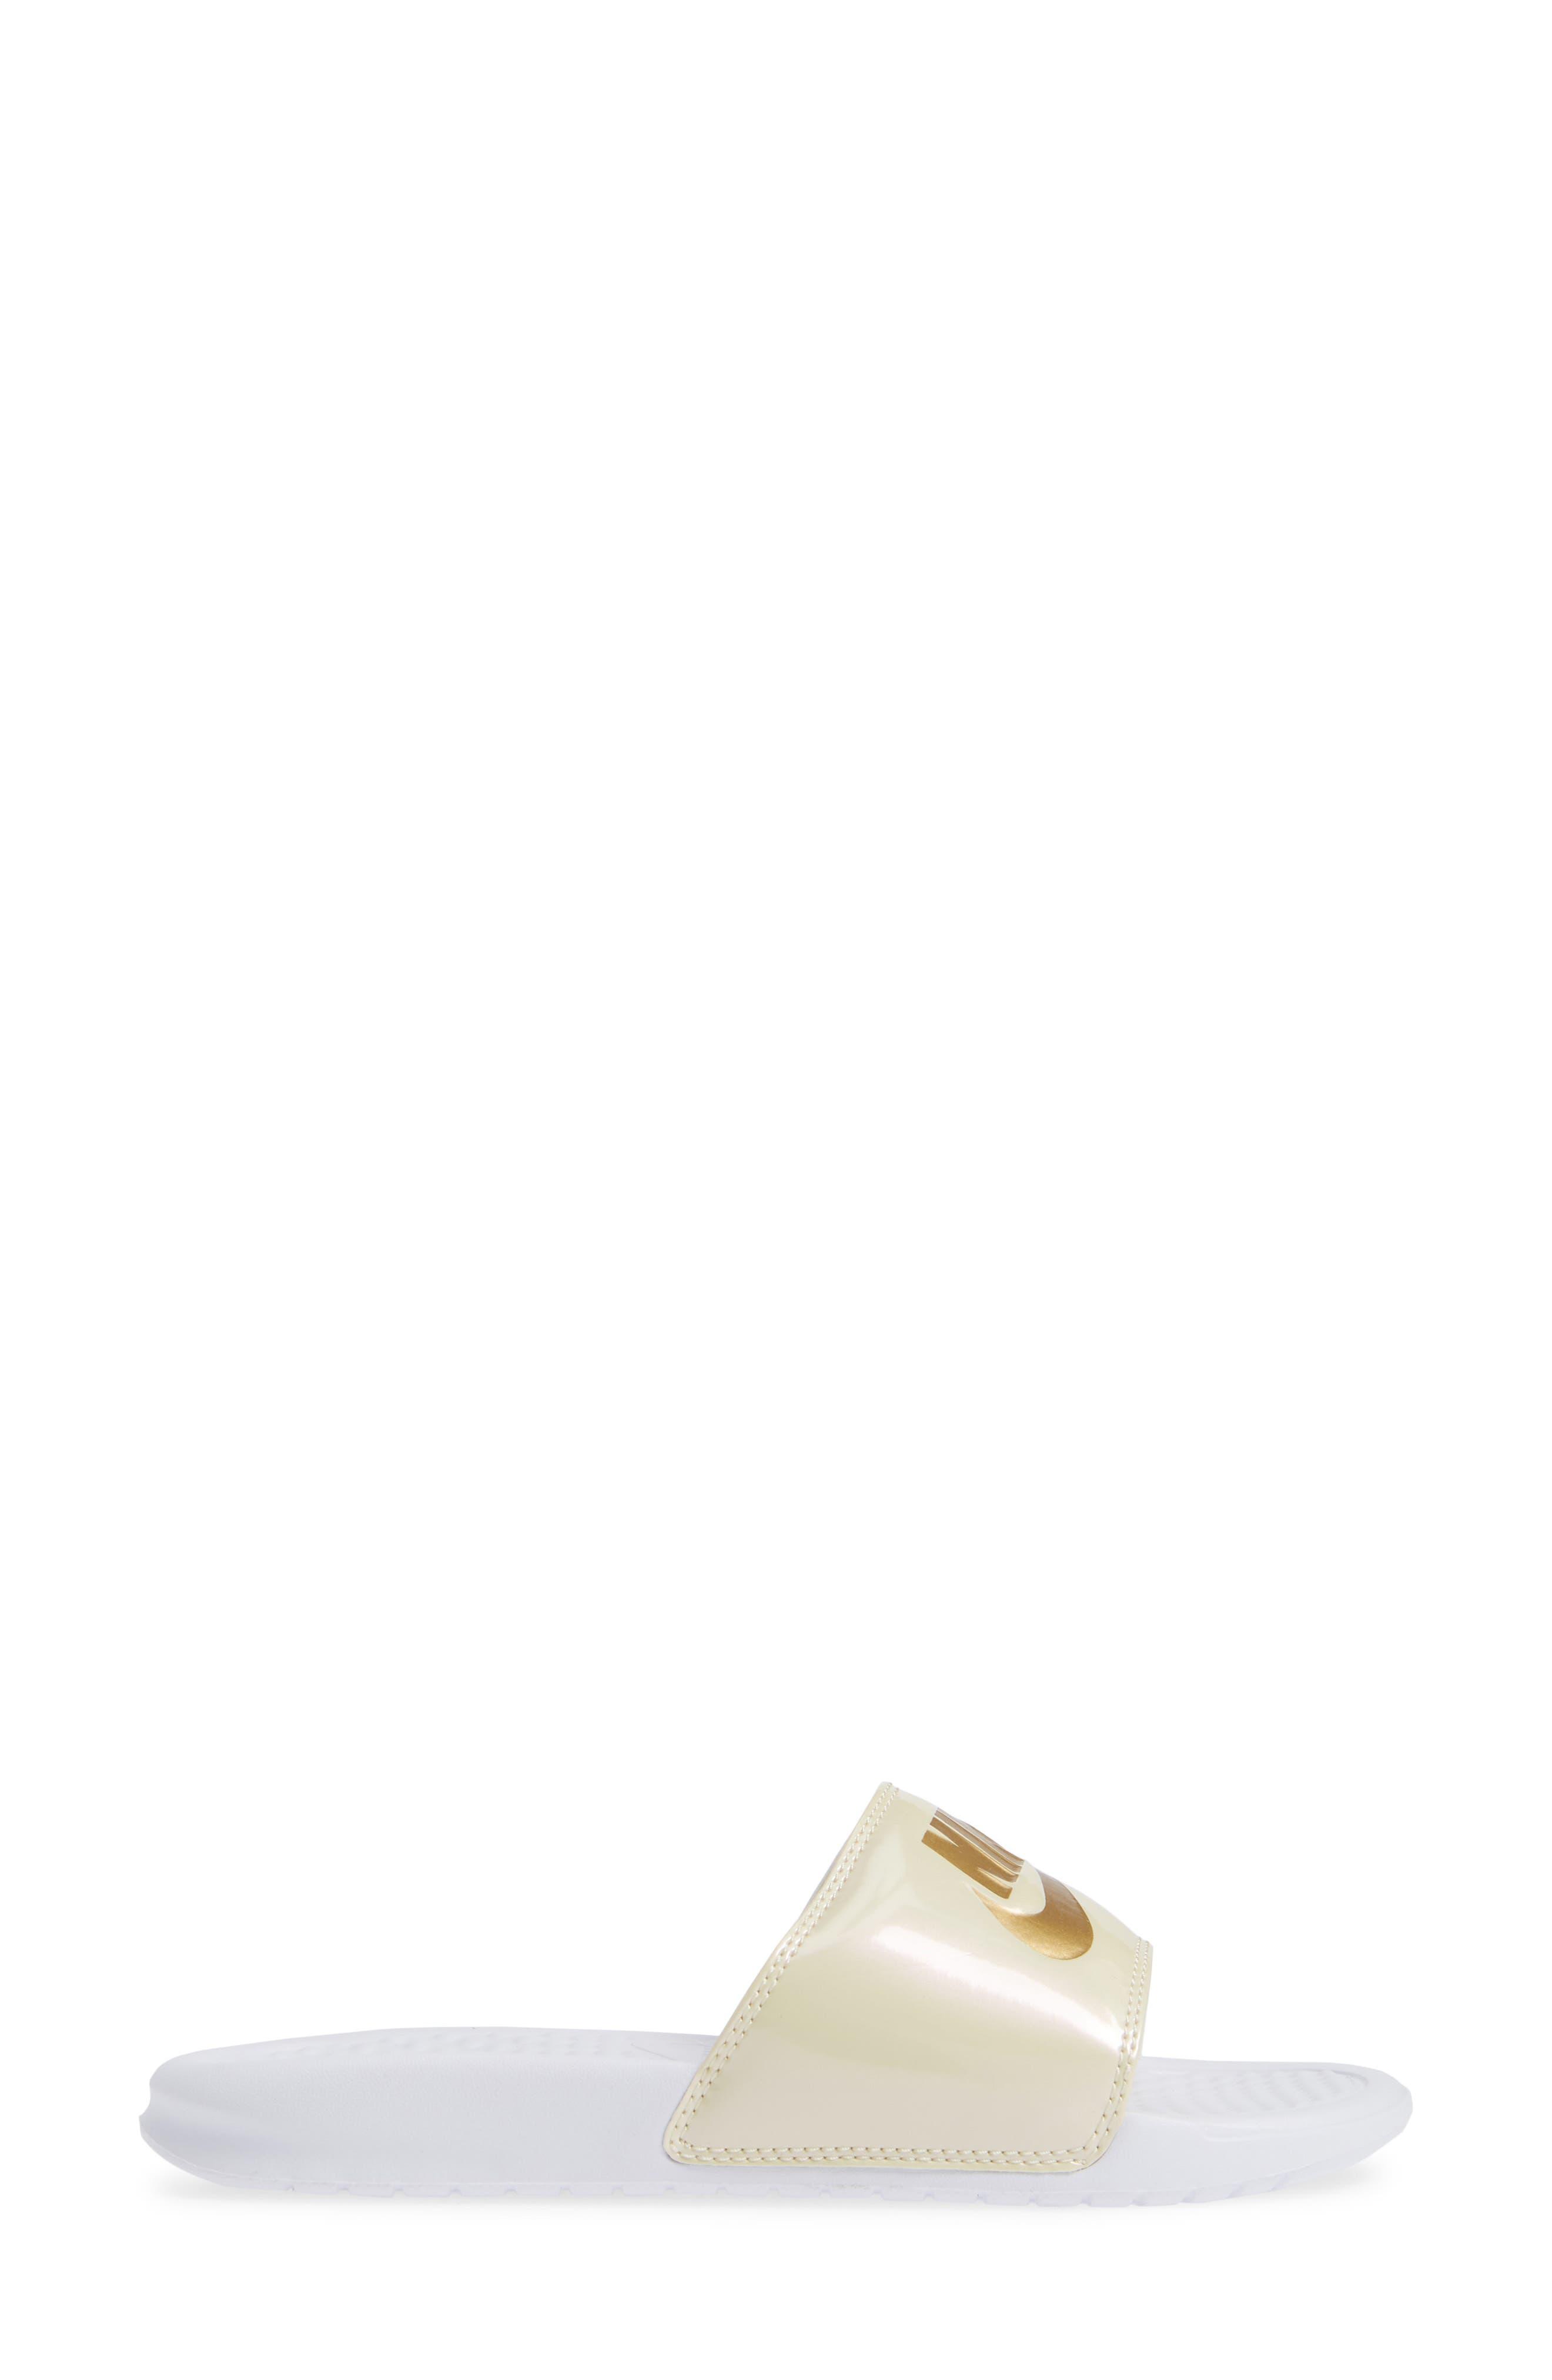 Benassi Just Do It Print Sandal,                             Alternate thumbnail 3, color,                             WHITE/ METALLIC GOLD/ BEACH